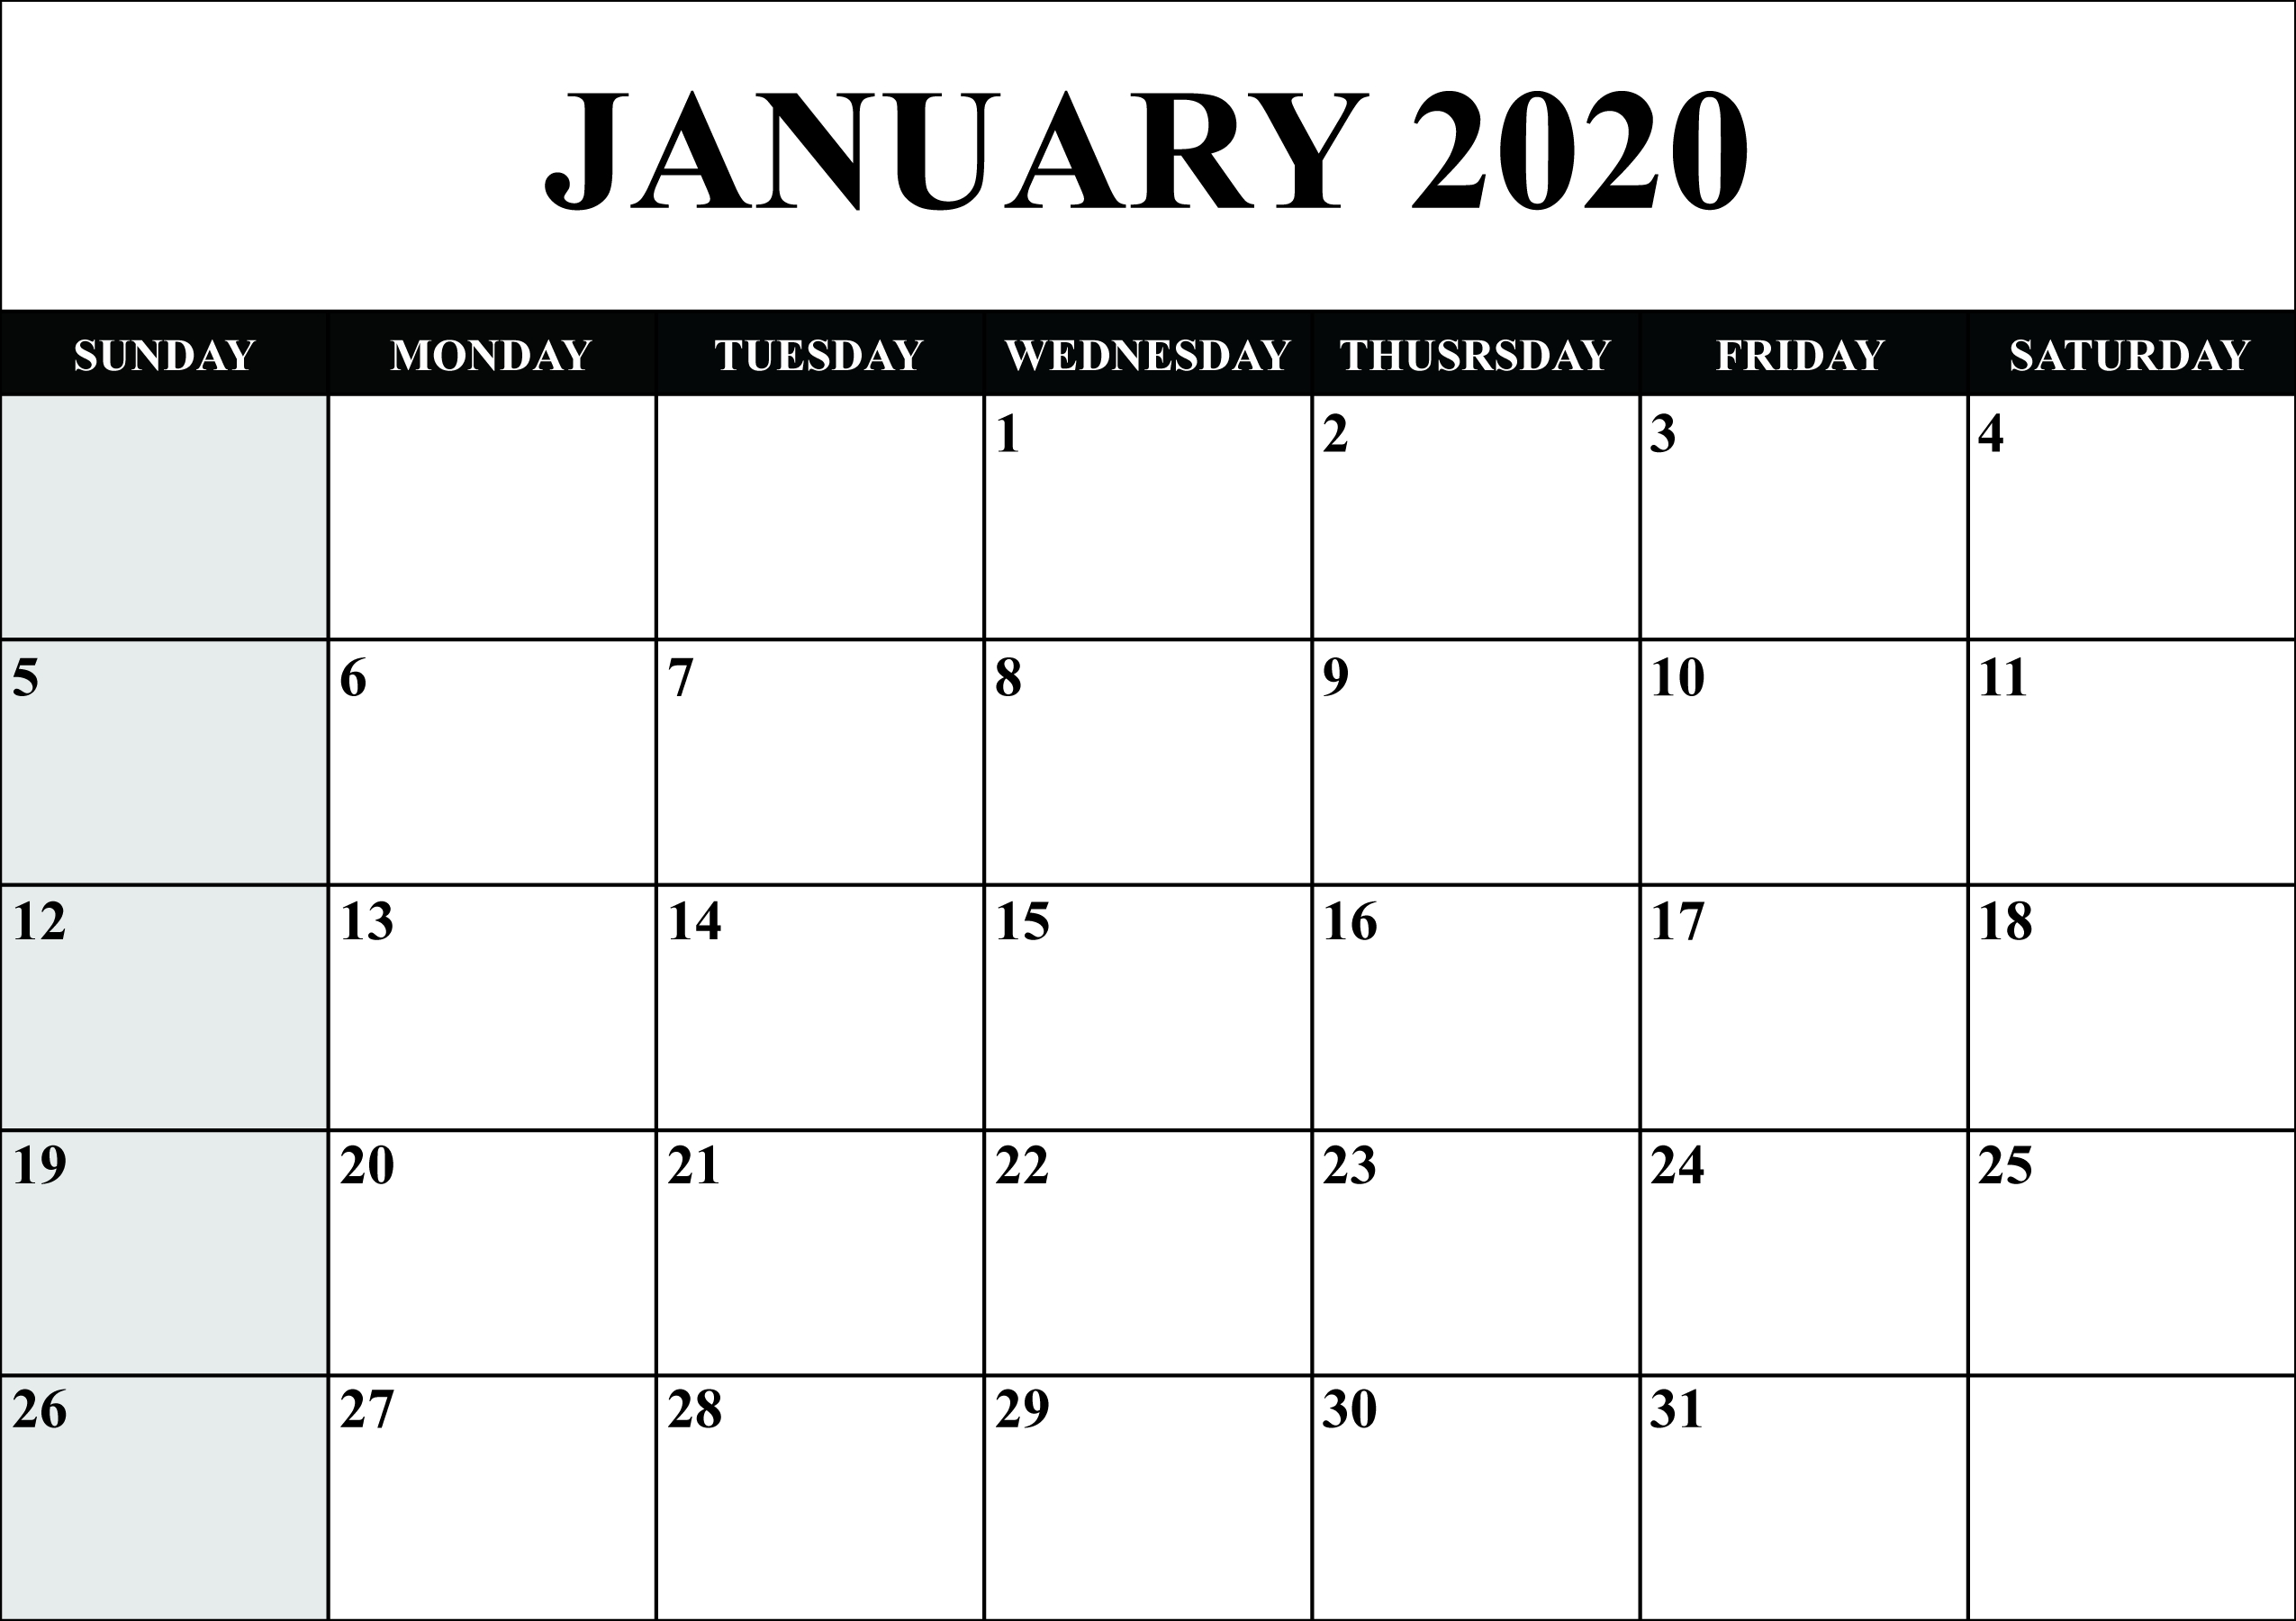 Free Blank January 2020 Calendar Printable In Pdf, Word-January 2020 Calendar Xl